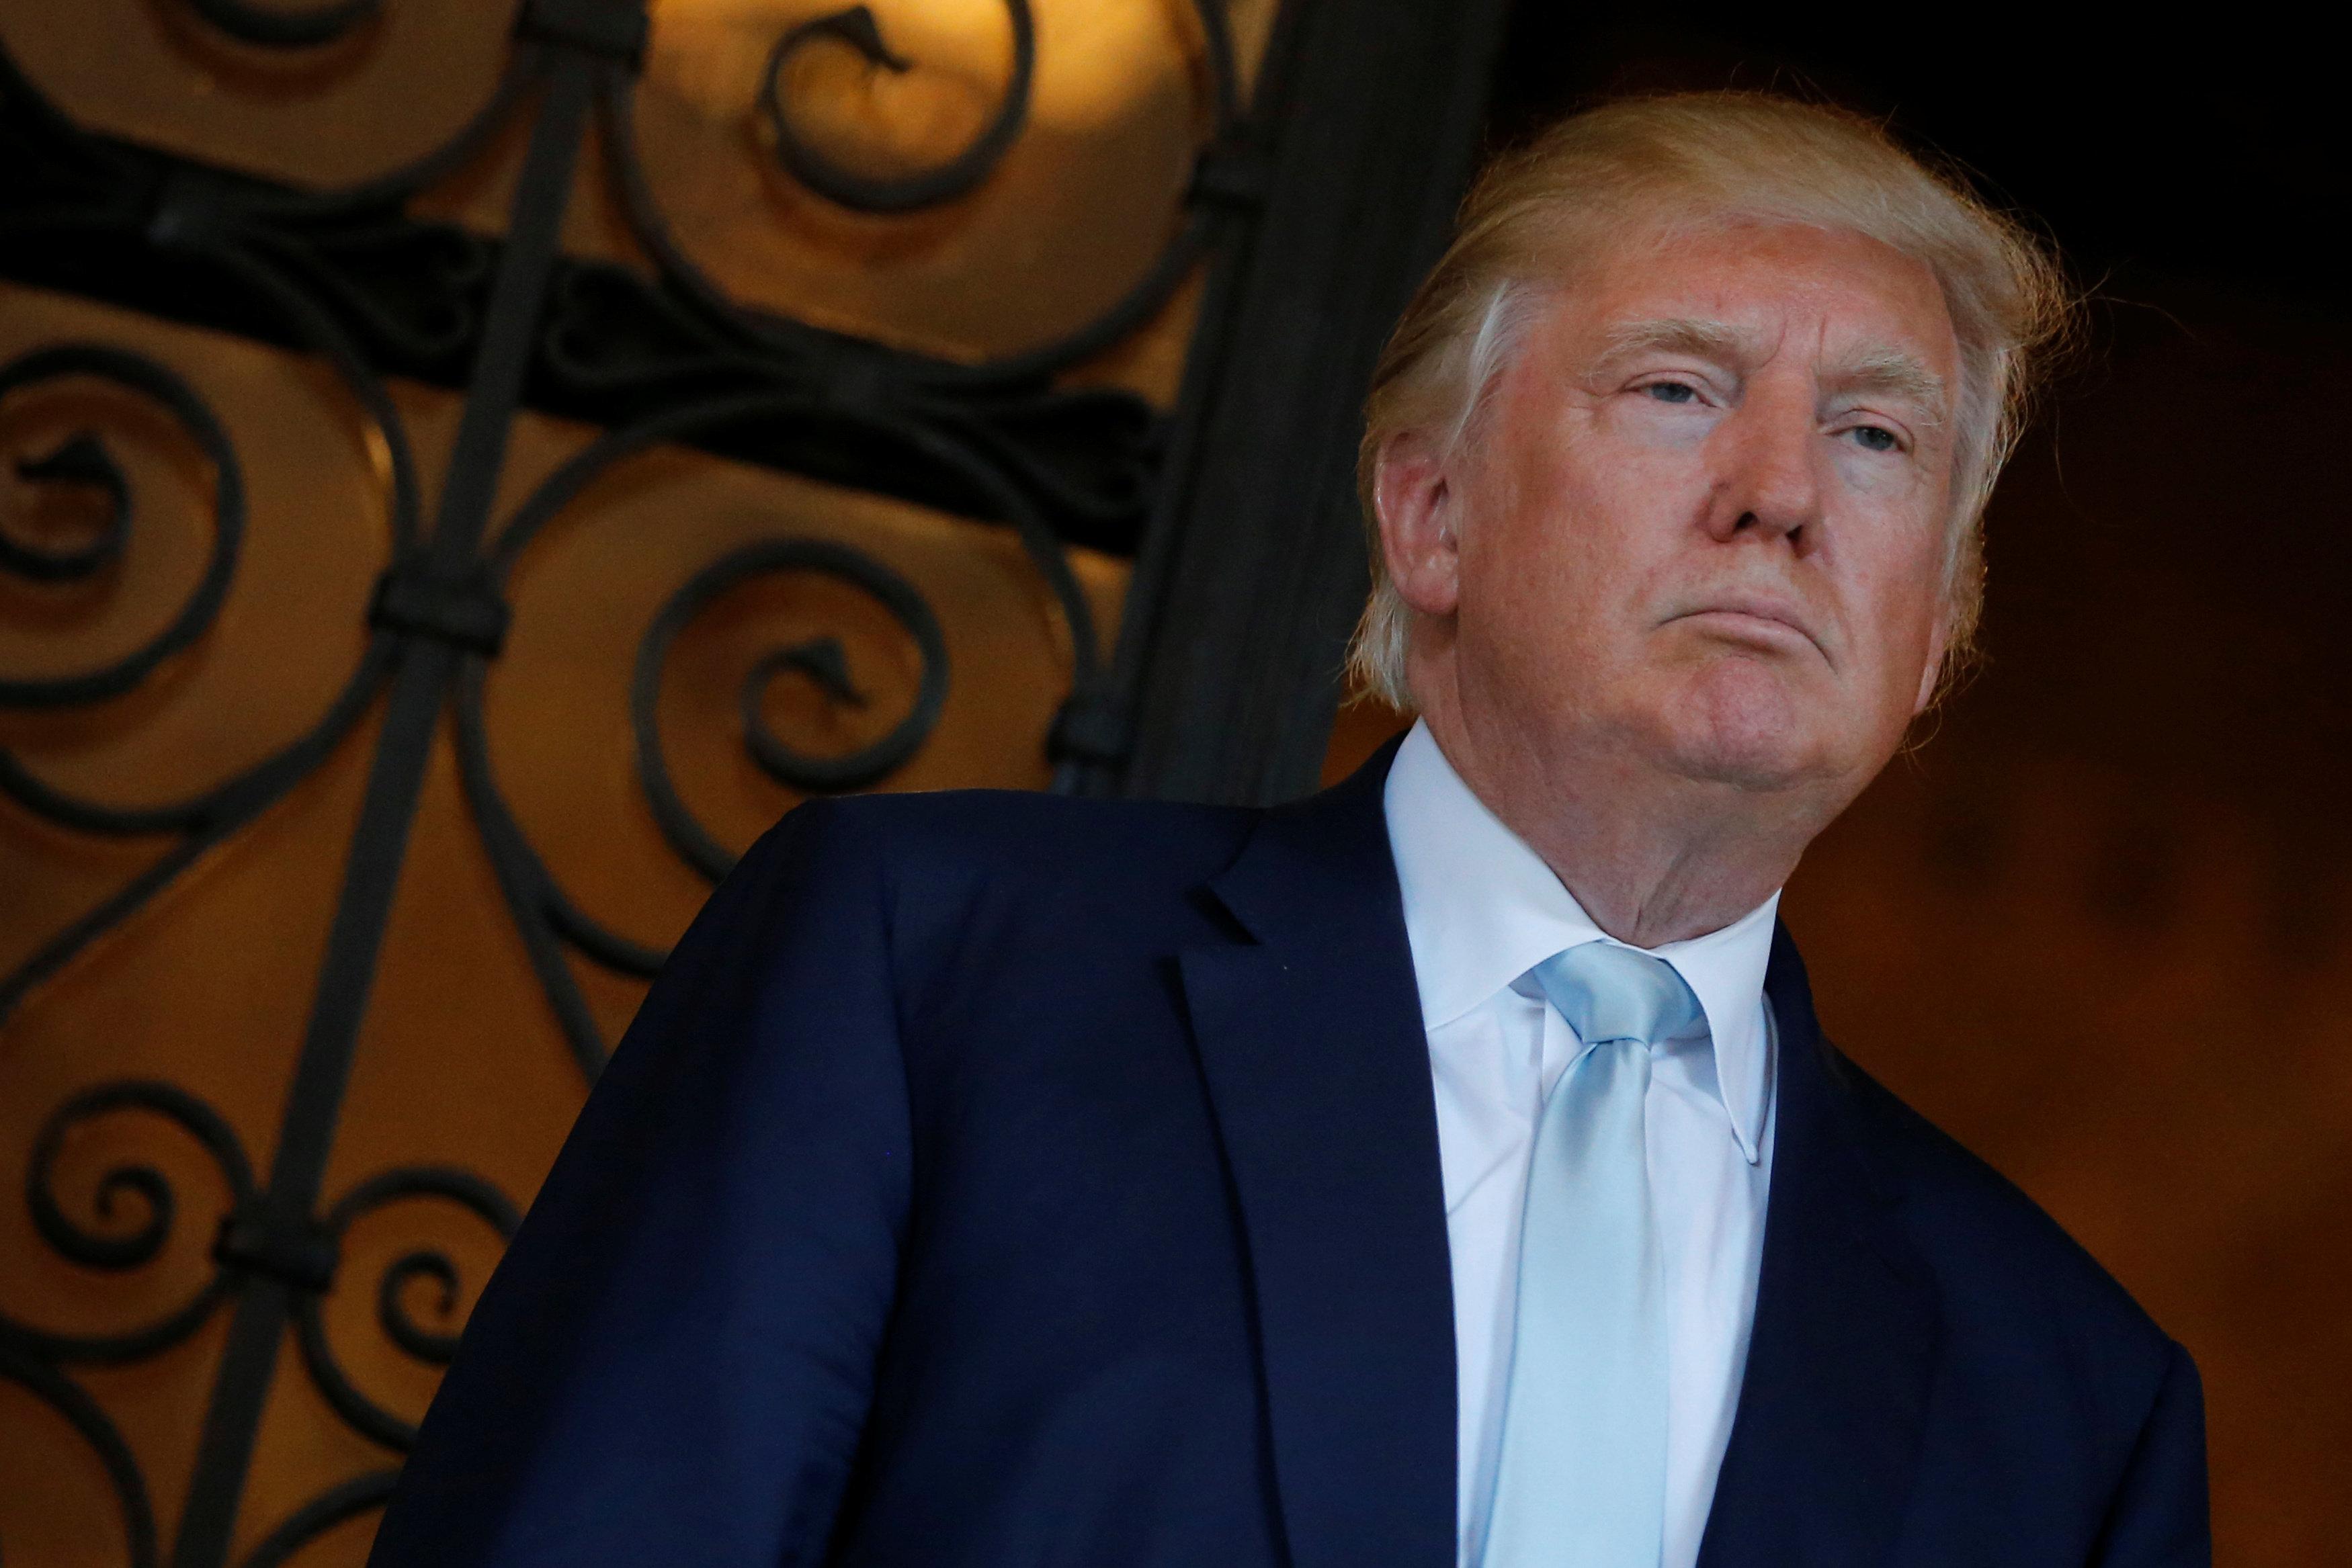 Donald Trump's Attitude Toward Hacking Raises Concerns Among Cybersecurity